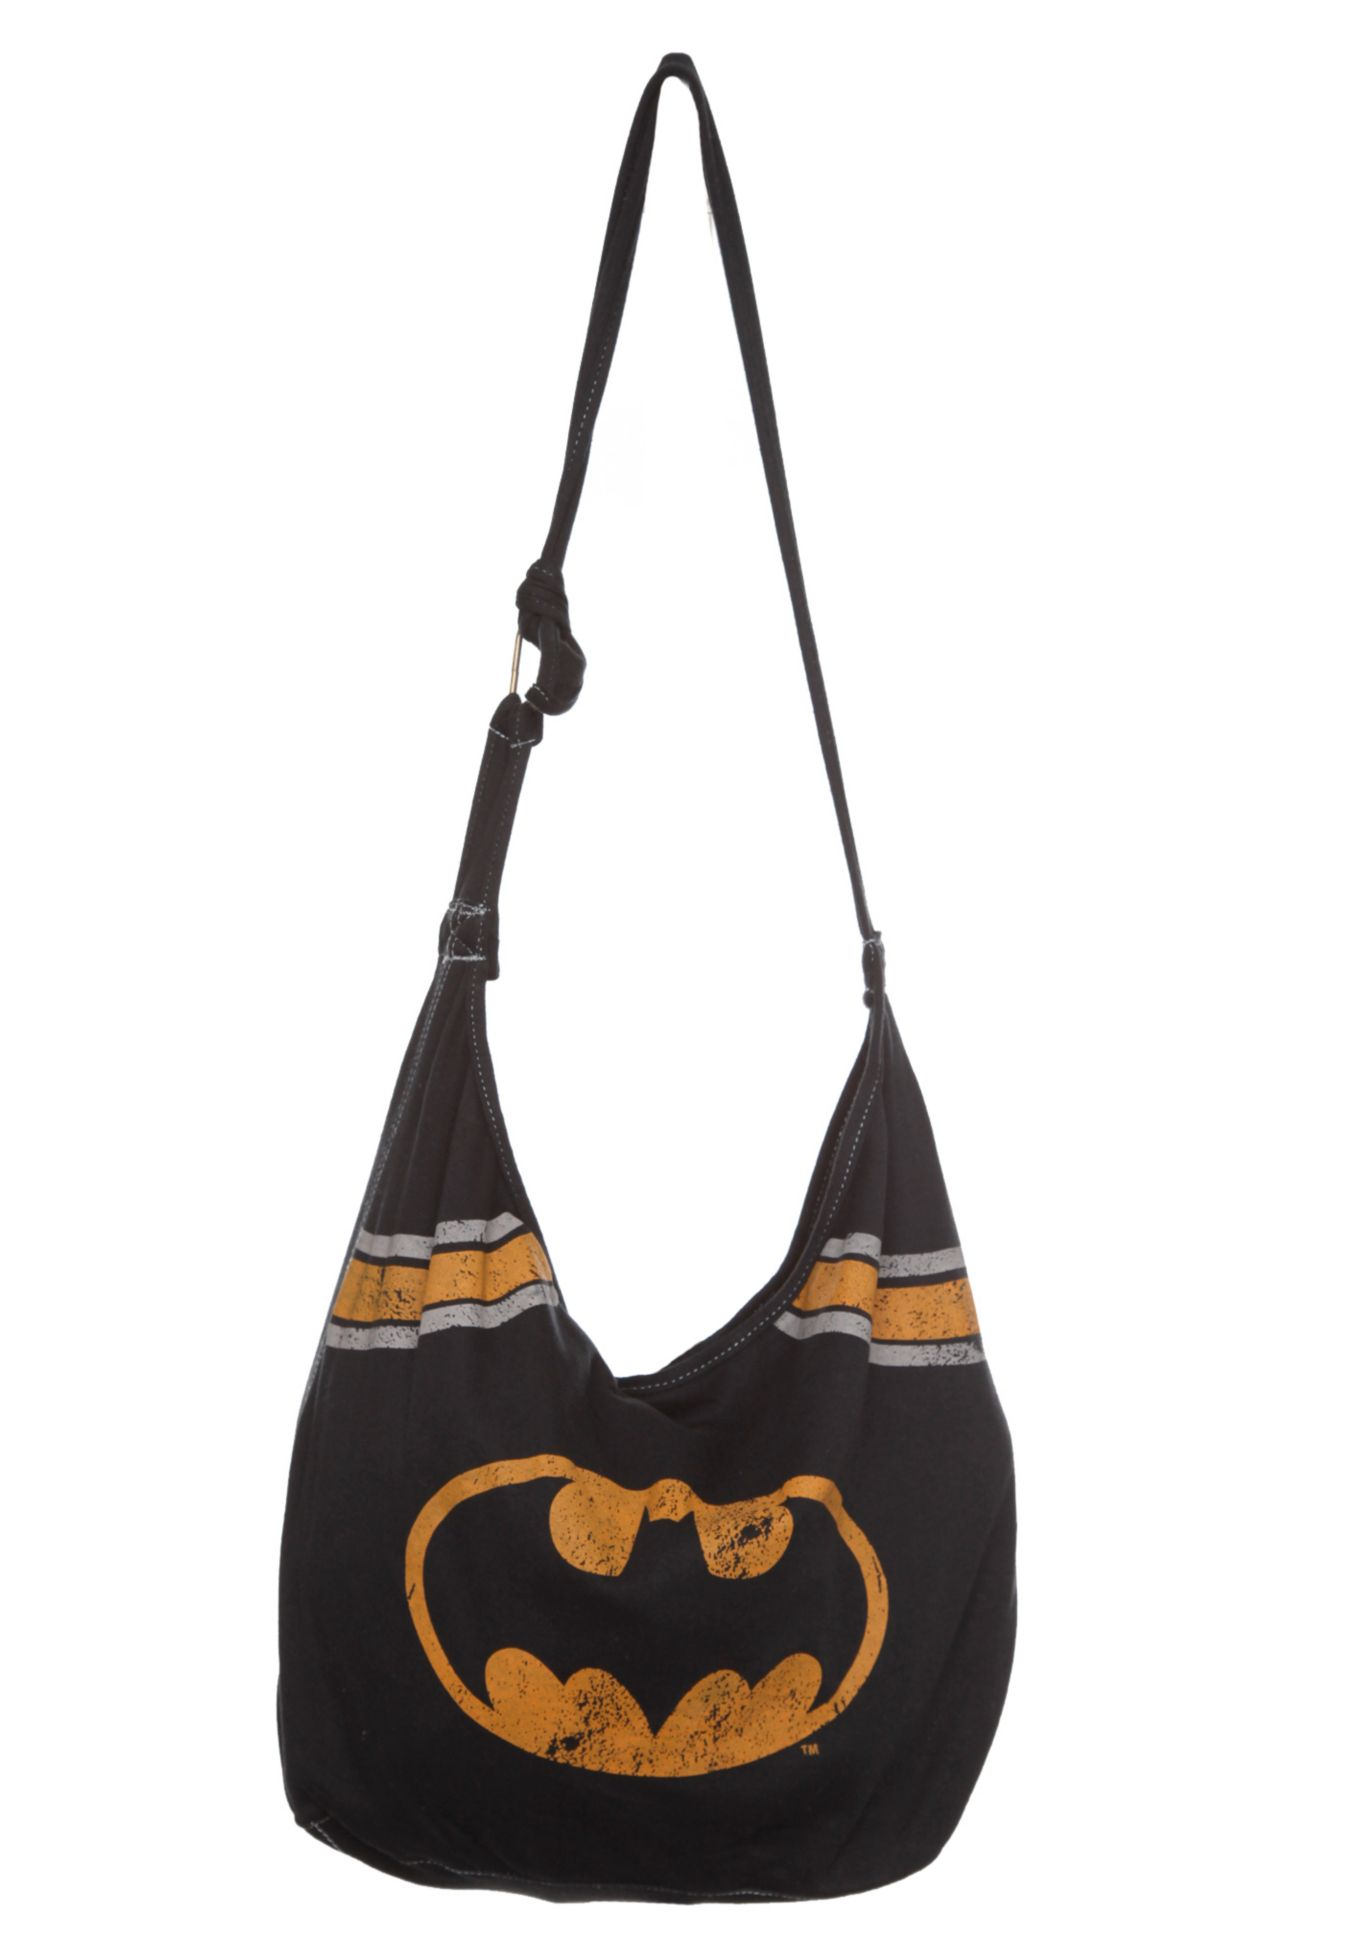 9eba01c46b3 Never leave the batcave without your Bat Bag. Super Herói, Estampas,  Produtividade,